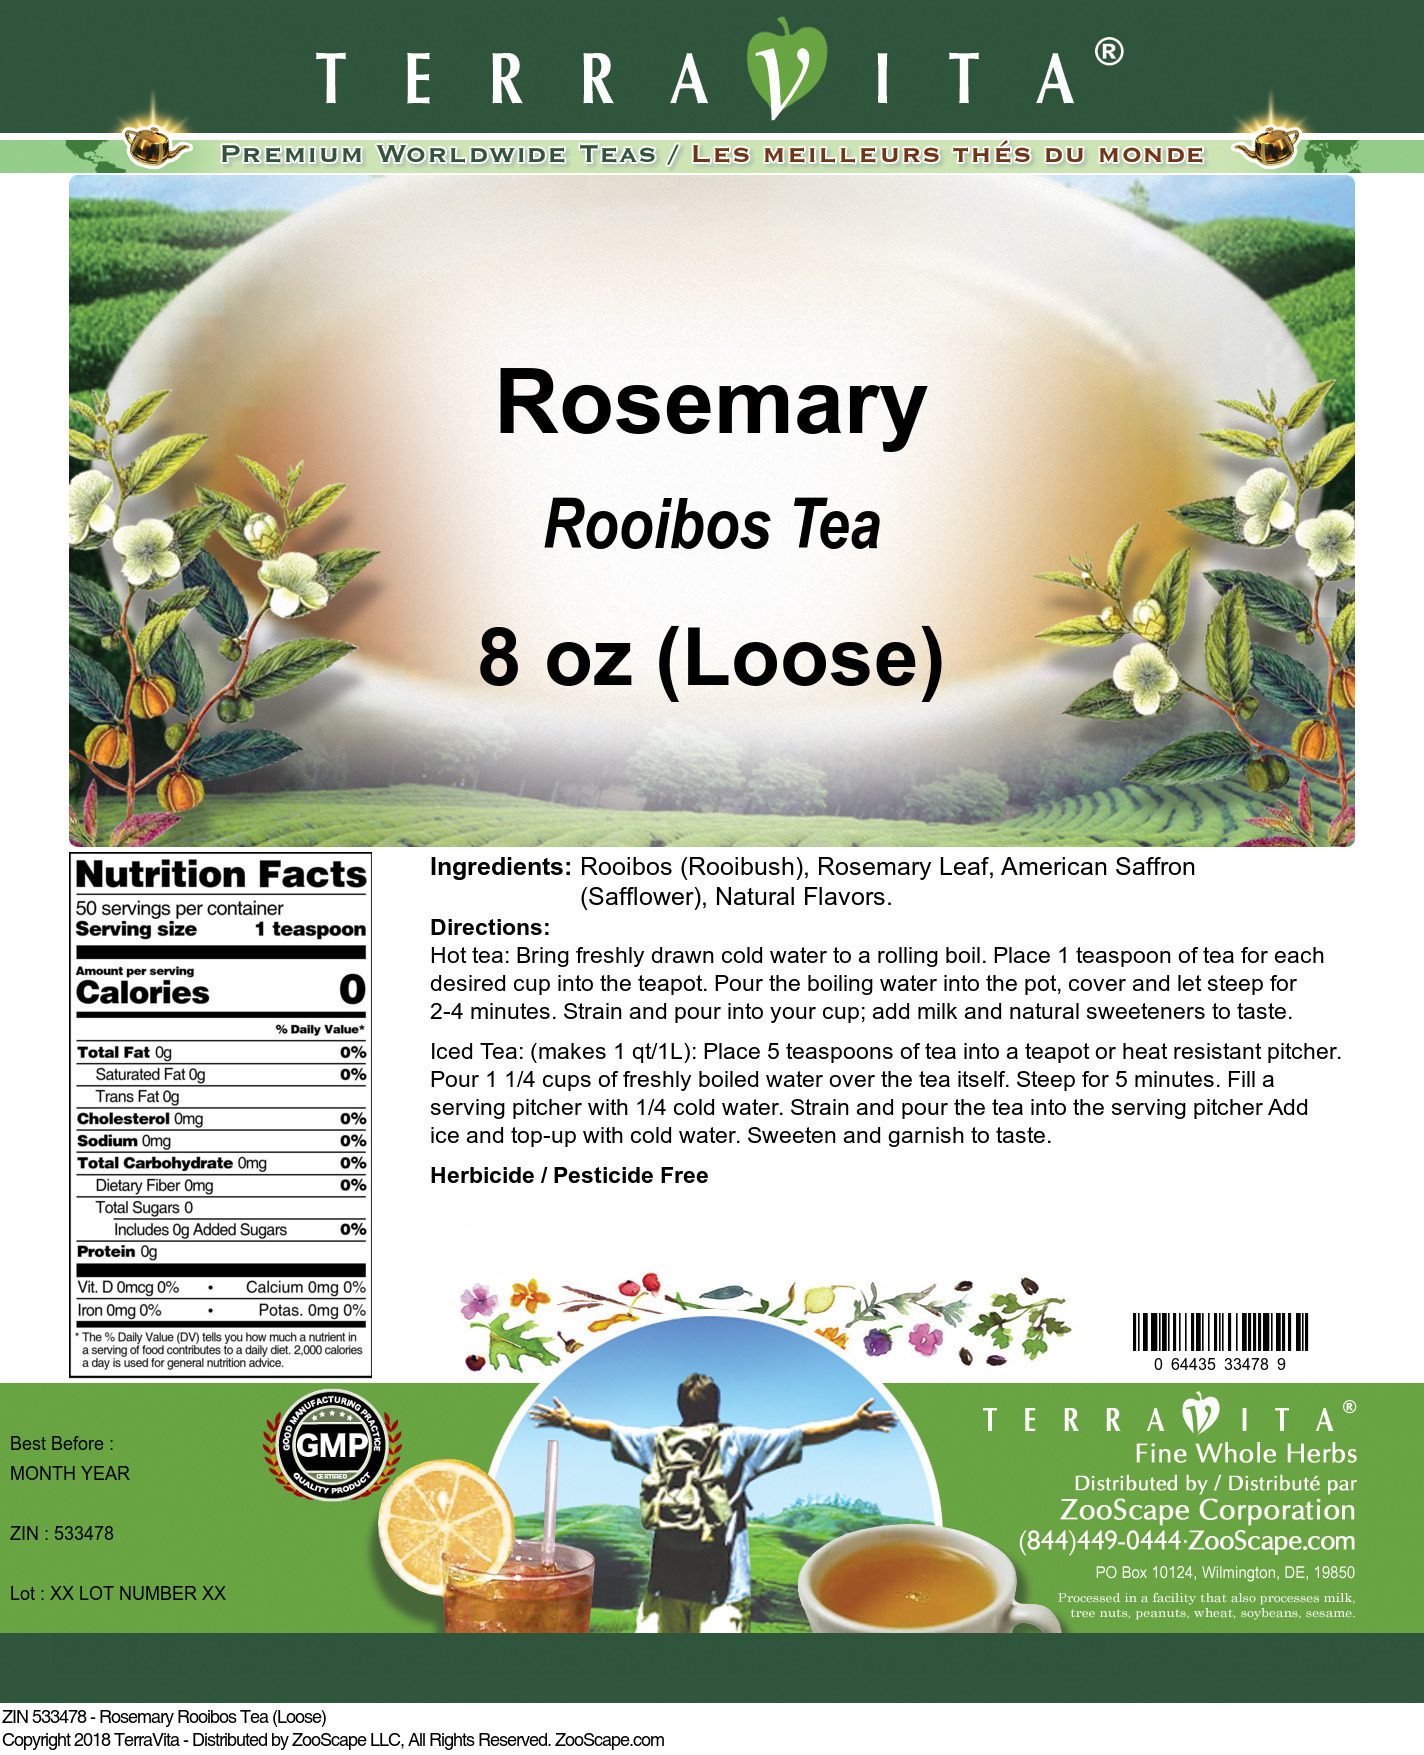 Rosemary Rooibos Tea (Loose)